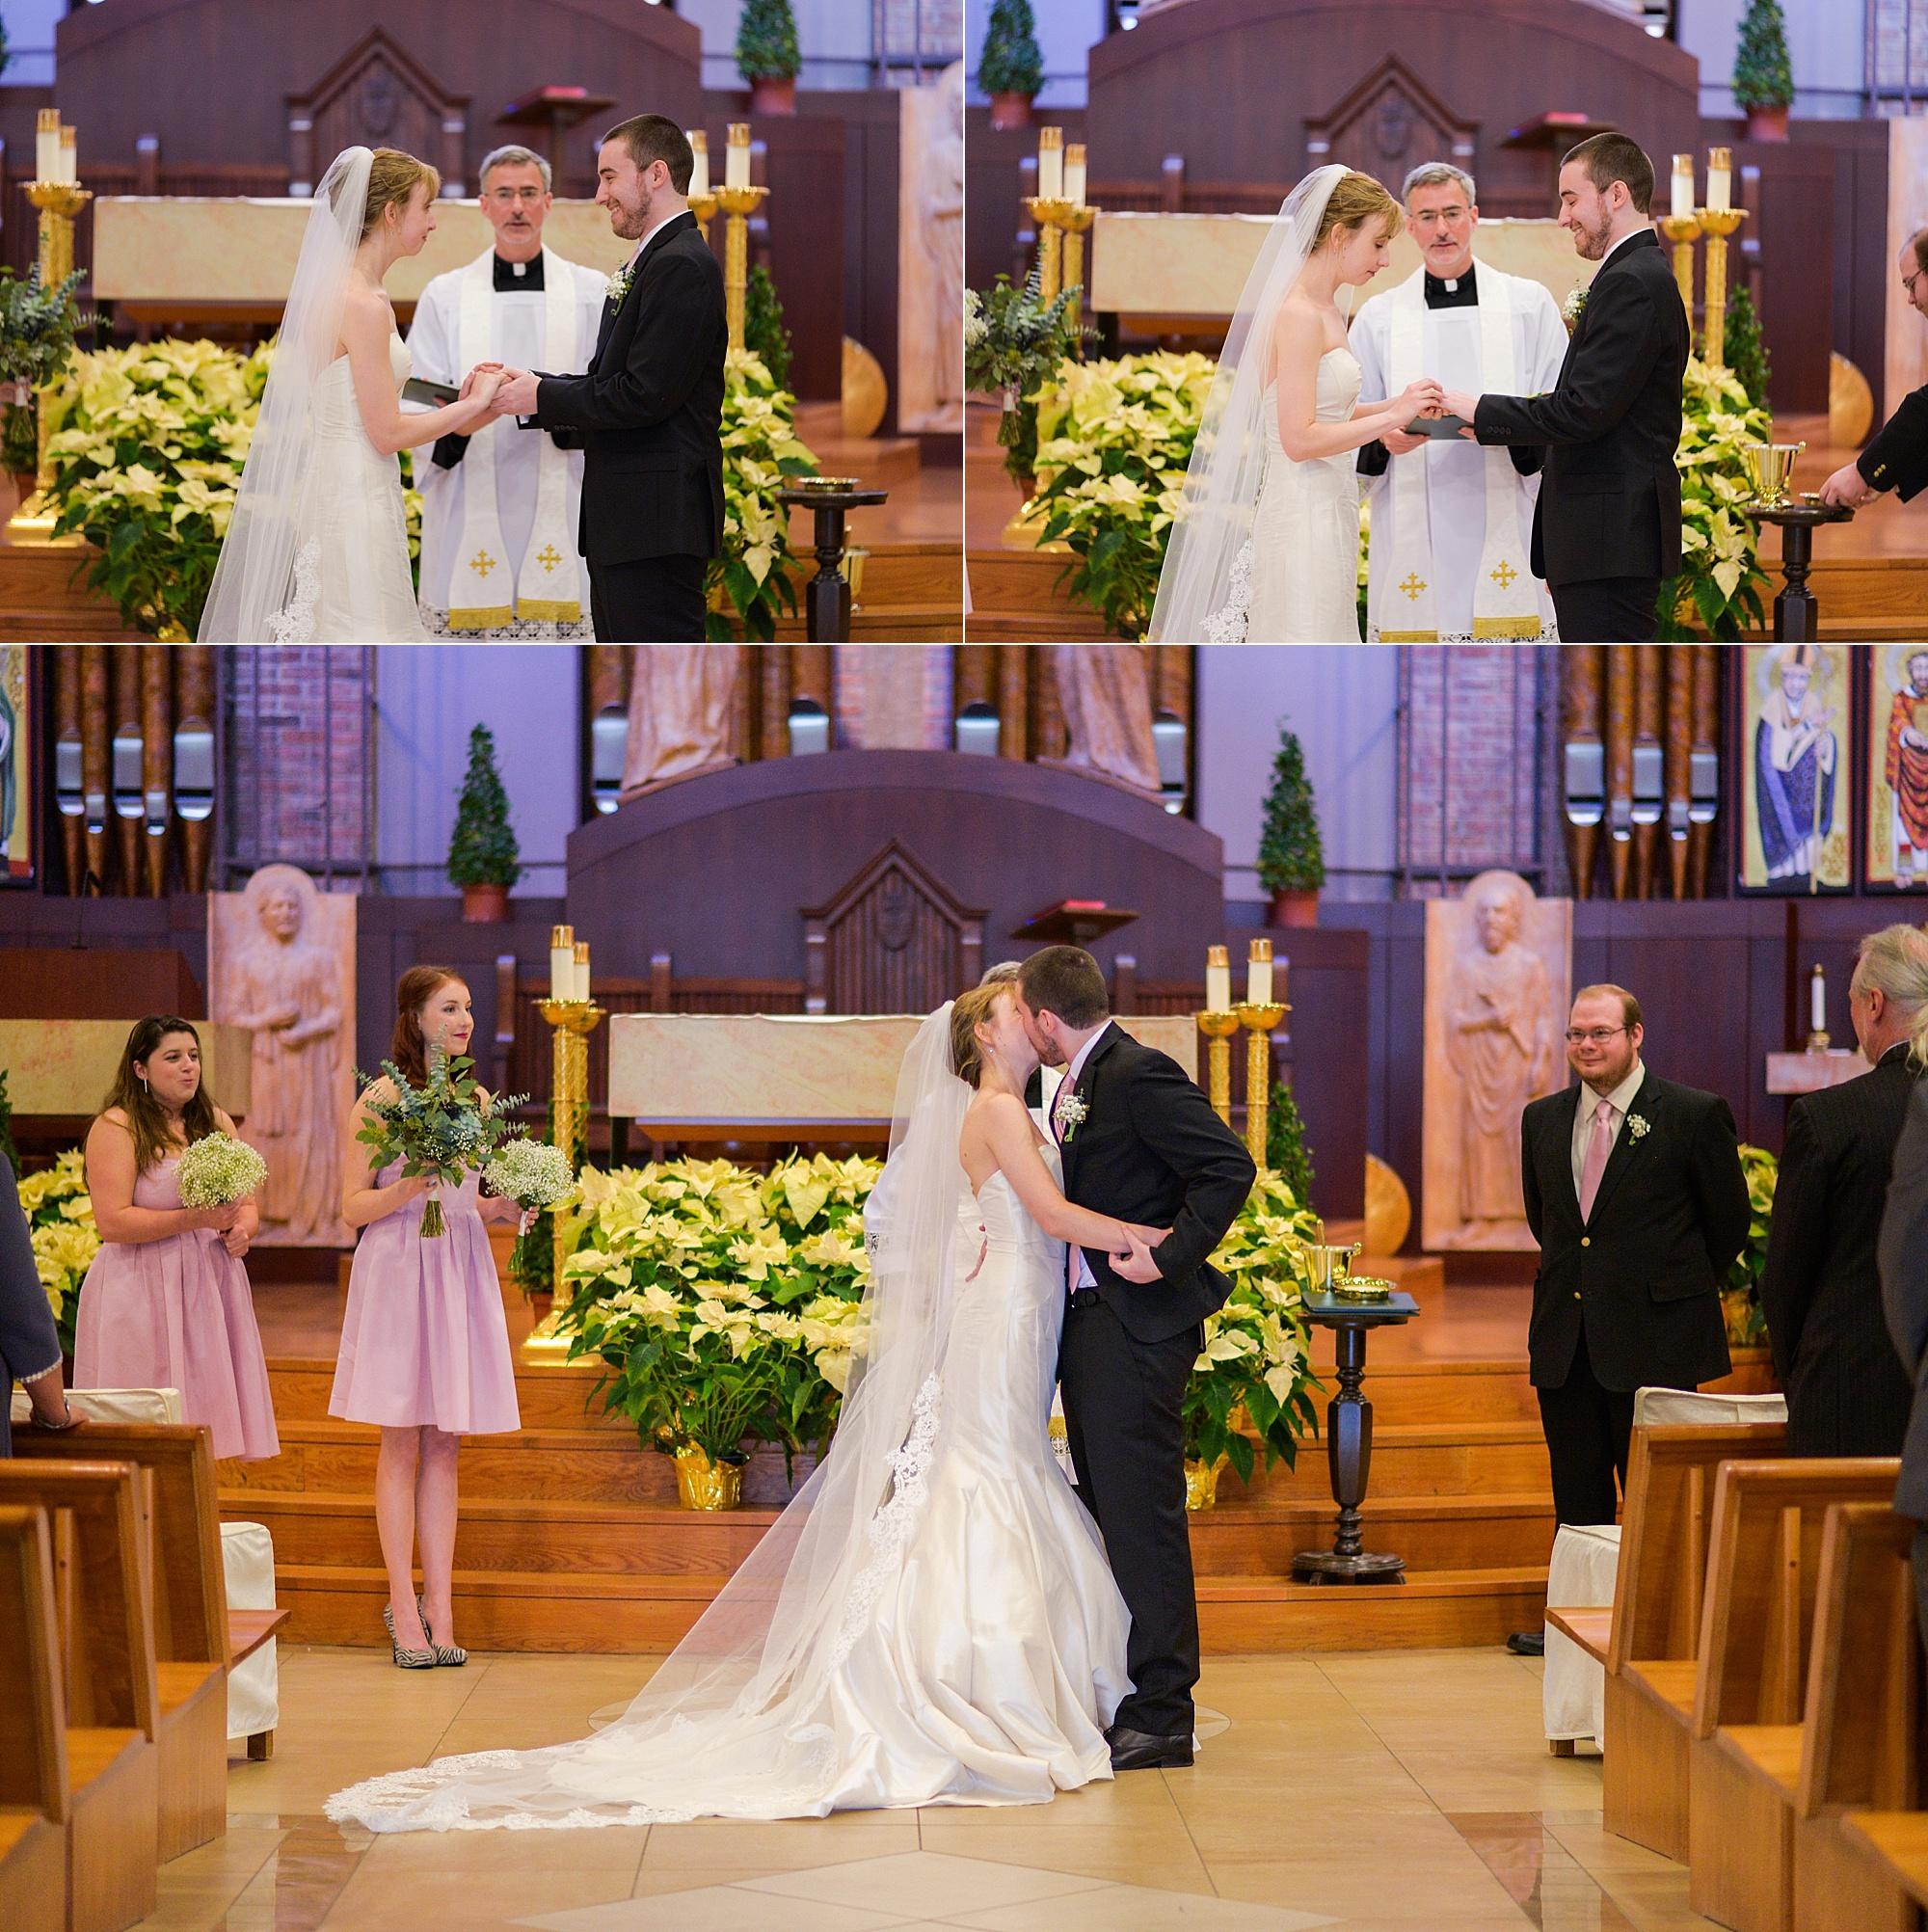 fredericksburg-wedding-church-mercantile_0021.jpg